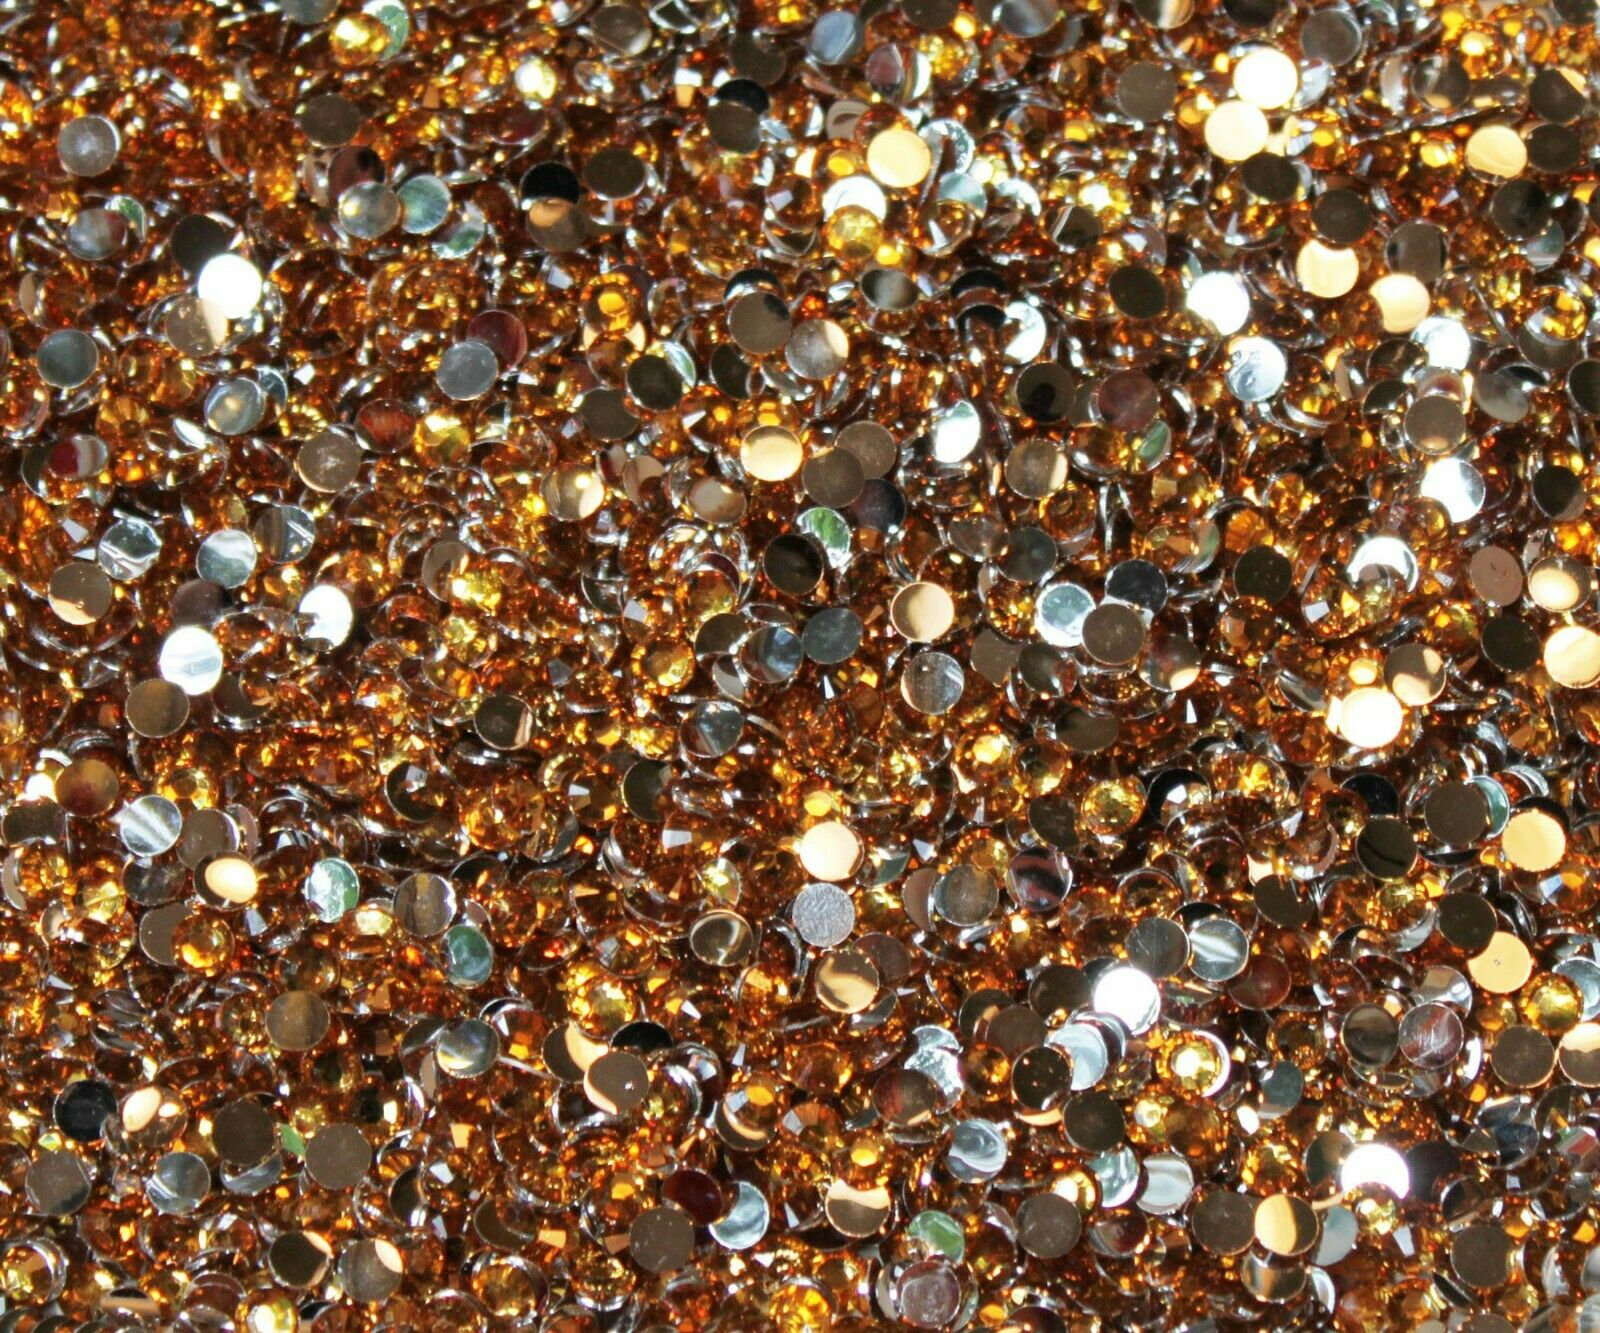 1000 Crystal Flat Back Resin Rhinestones Gems 60 colors, 2mm, 3mm, 4mm, 5mm, 6.5 GOLD